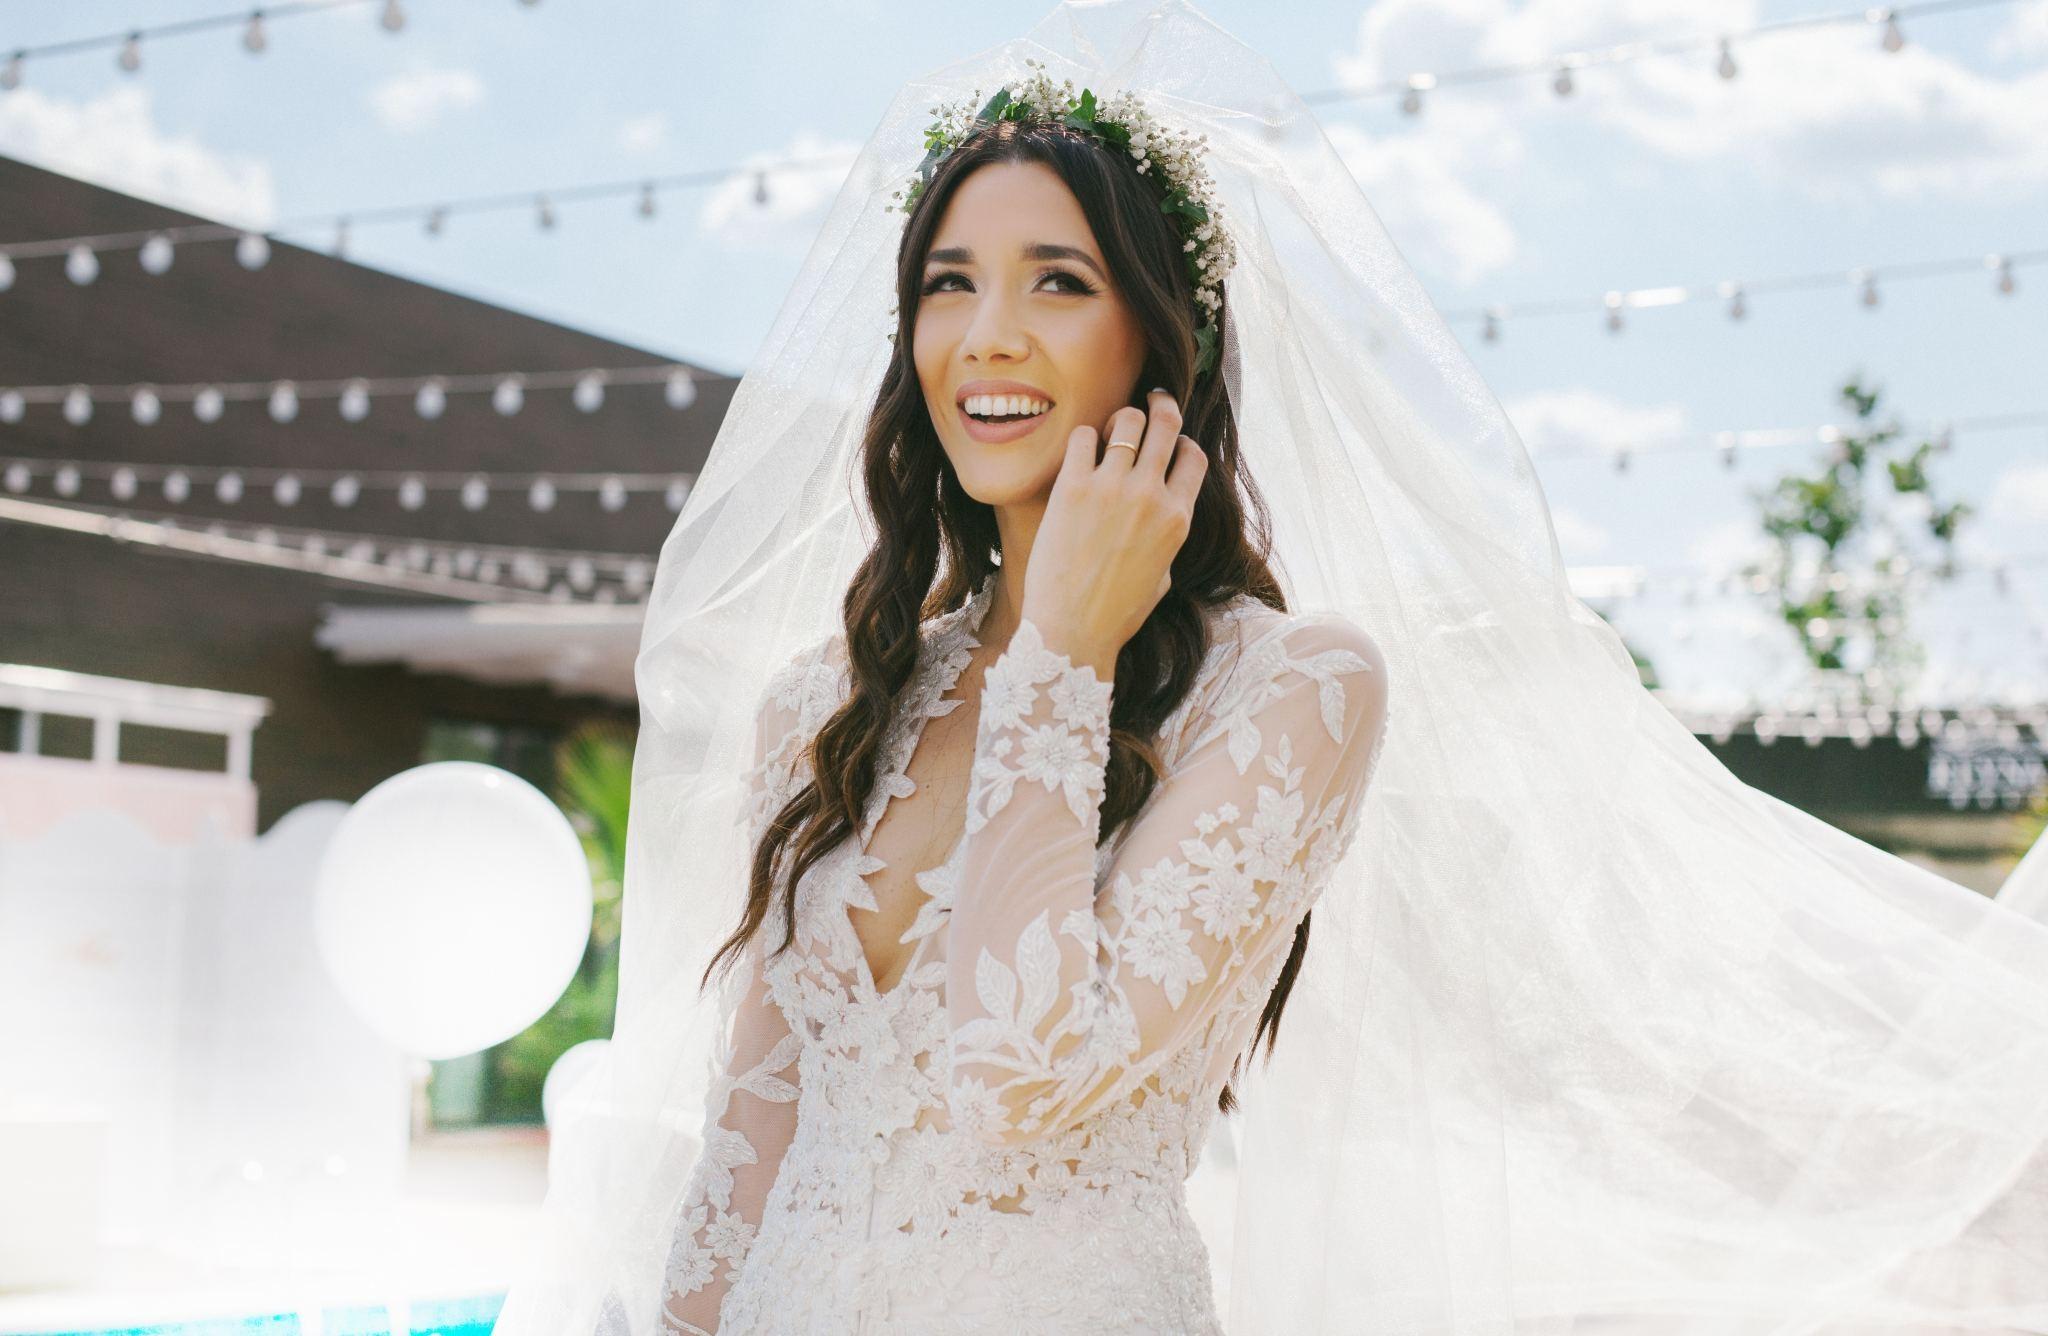 nunta-otrava-fabuloasa_fabulous-muses_nunta2015_blogger-wedding-diana-enciu_alina-tanasa_nunta-anului-17